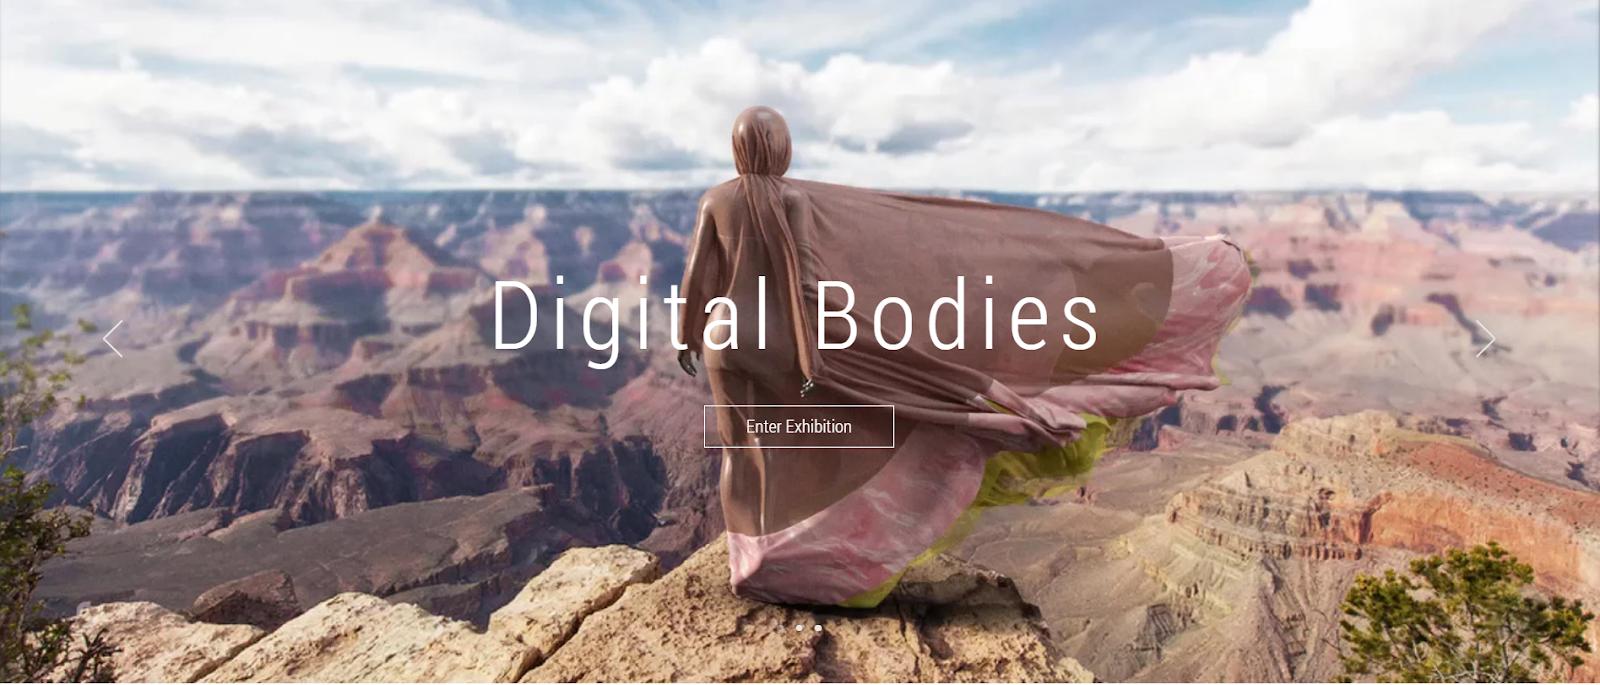 "The MoCDA's most recent NFT digital art exhibition, ""Digital Bodies,"" is popular in the market."